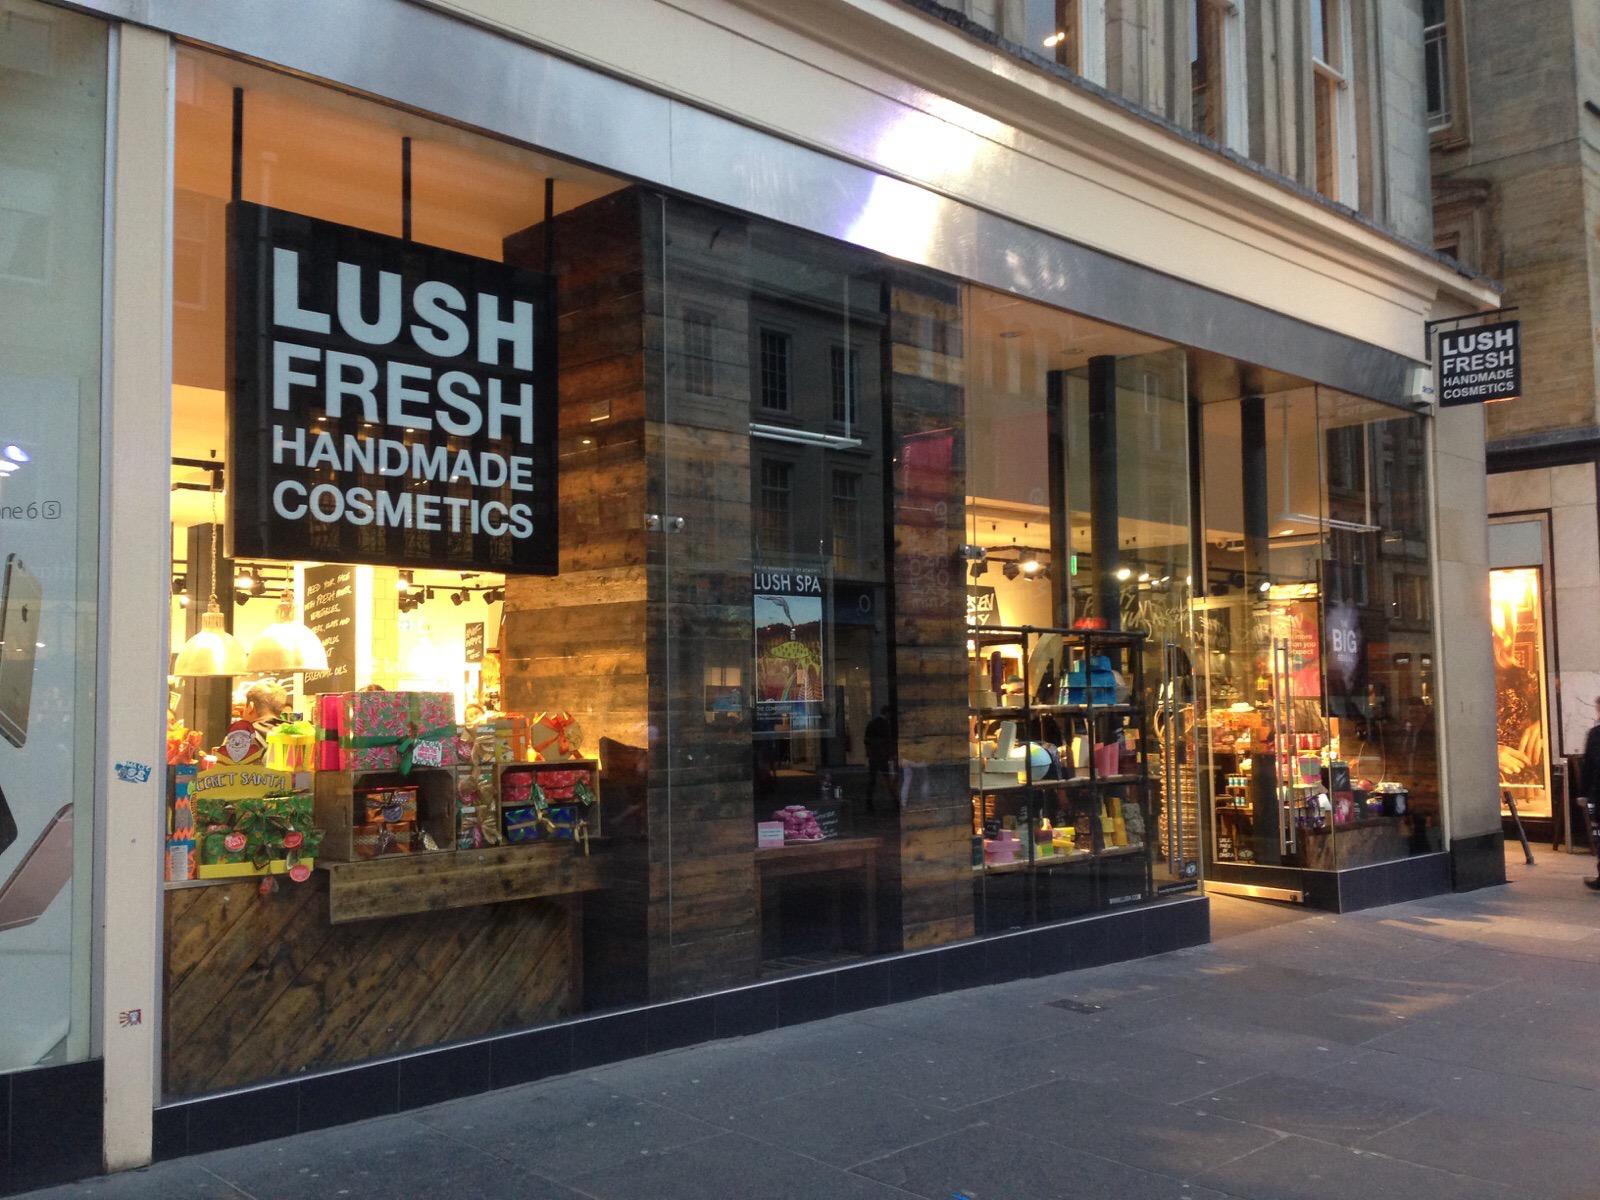 Lush Buchanan Street (Glasgow)